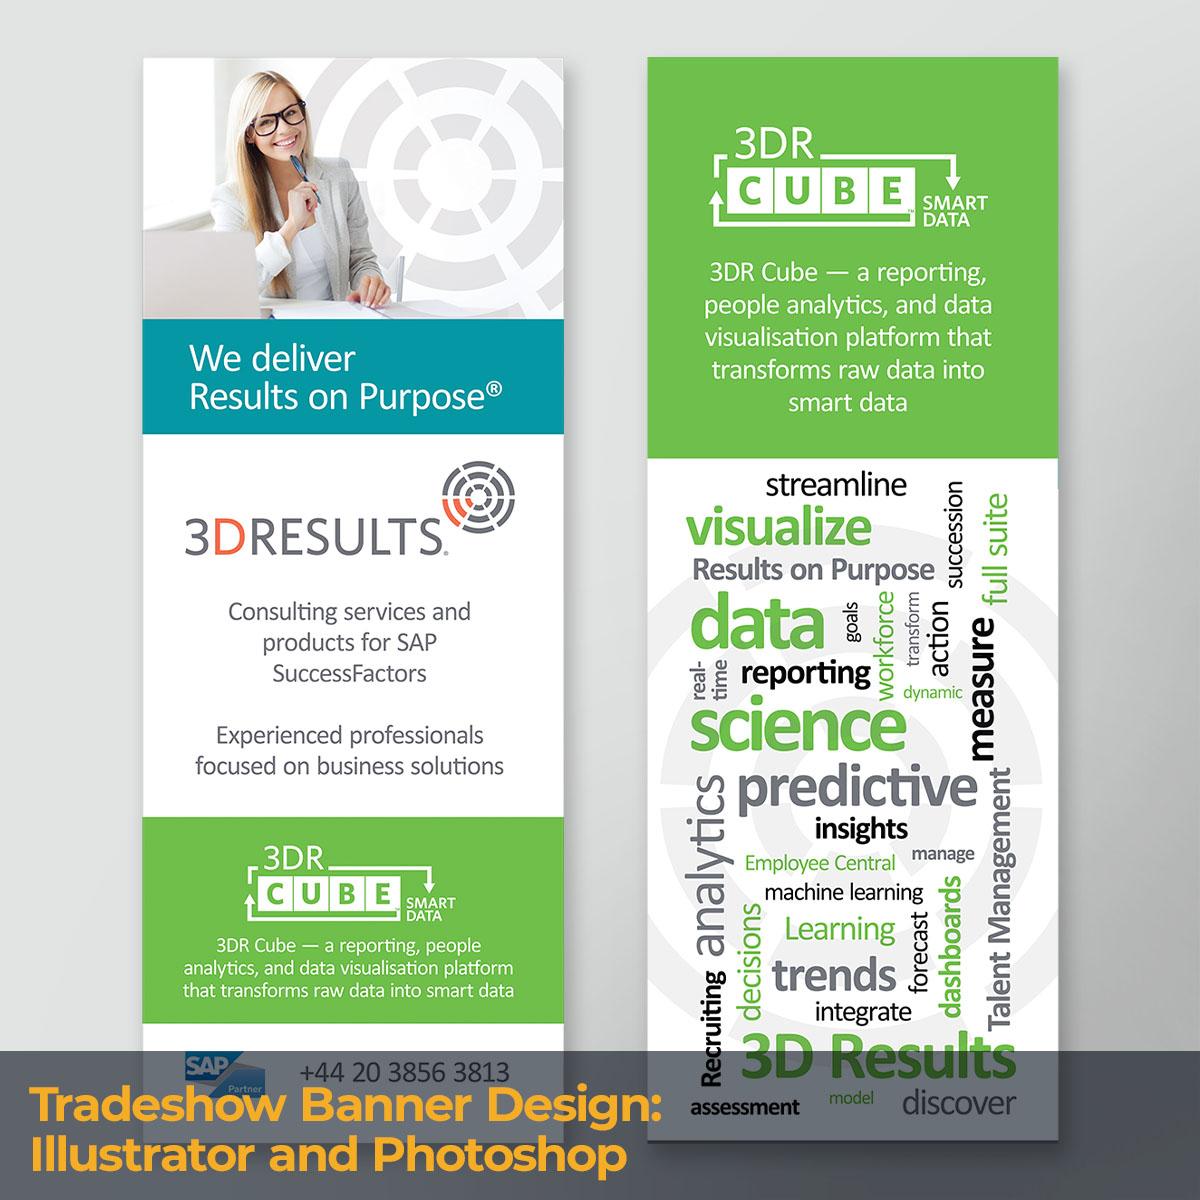 Tradeshow Banner Design 2